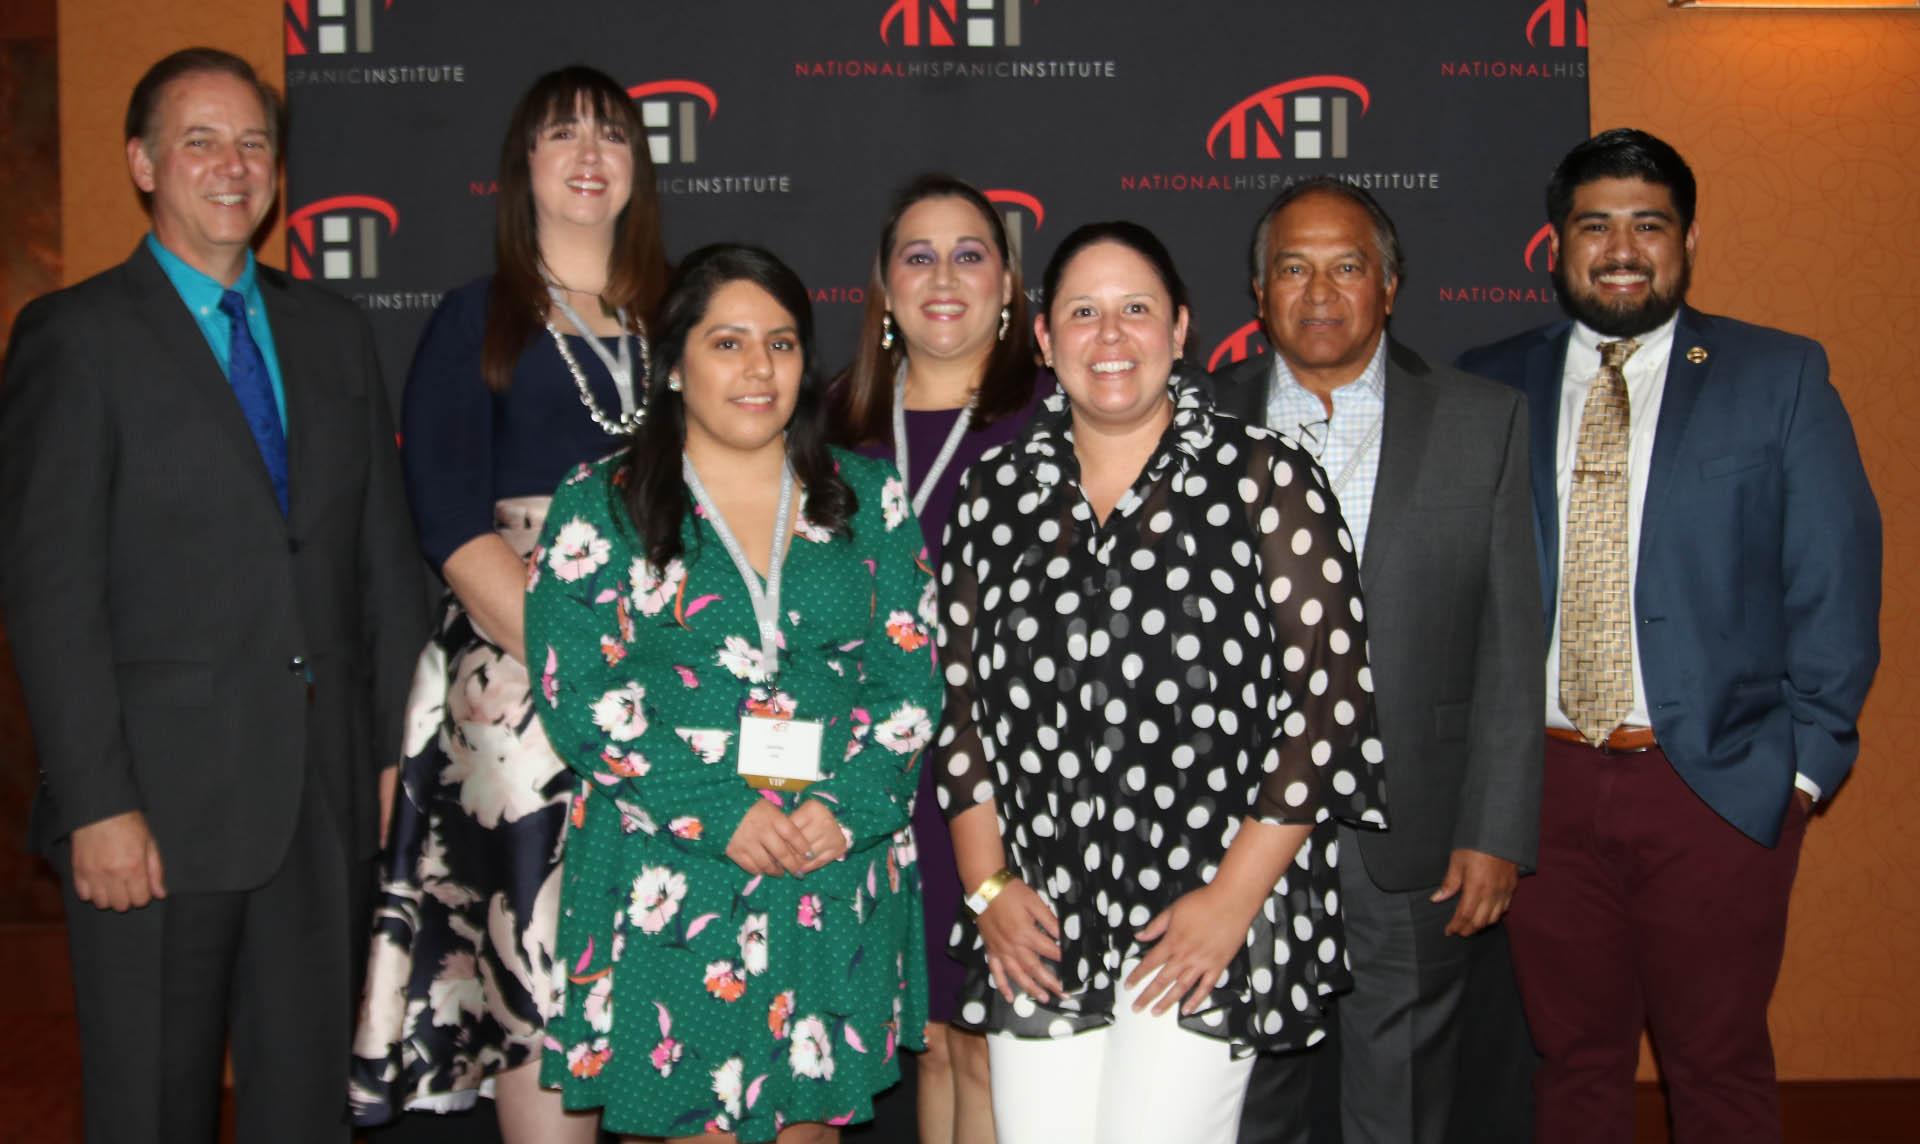 2018 NHI Award Winners at this year's Celebracion event.